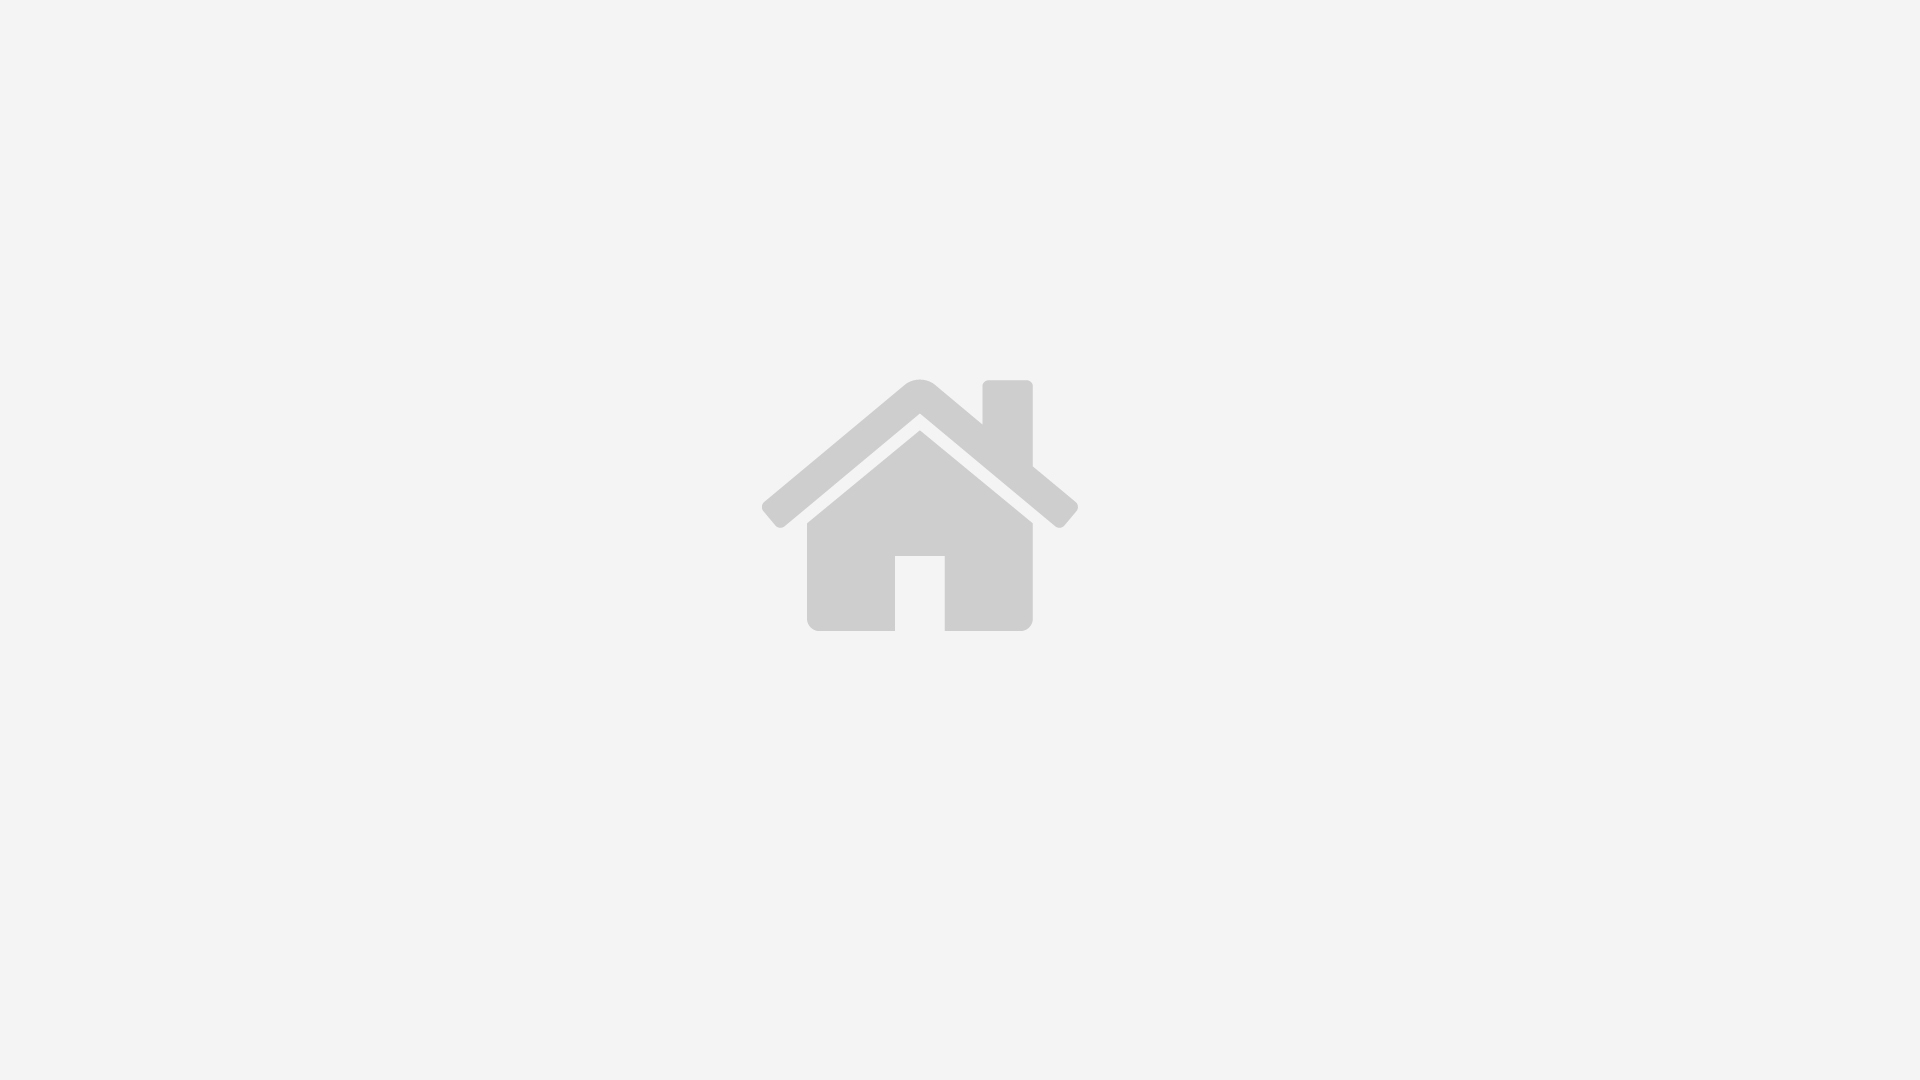 shutterstock_59052949